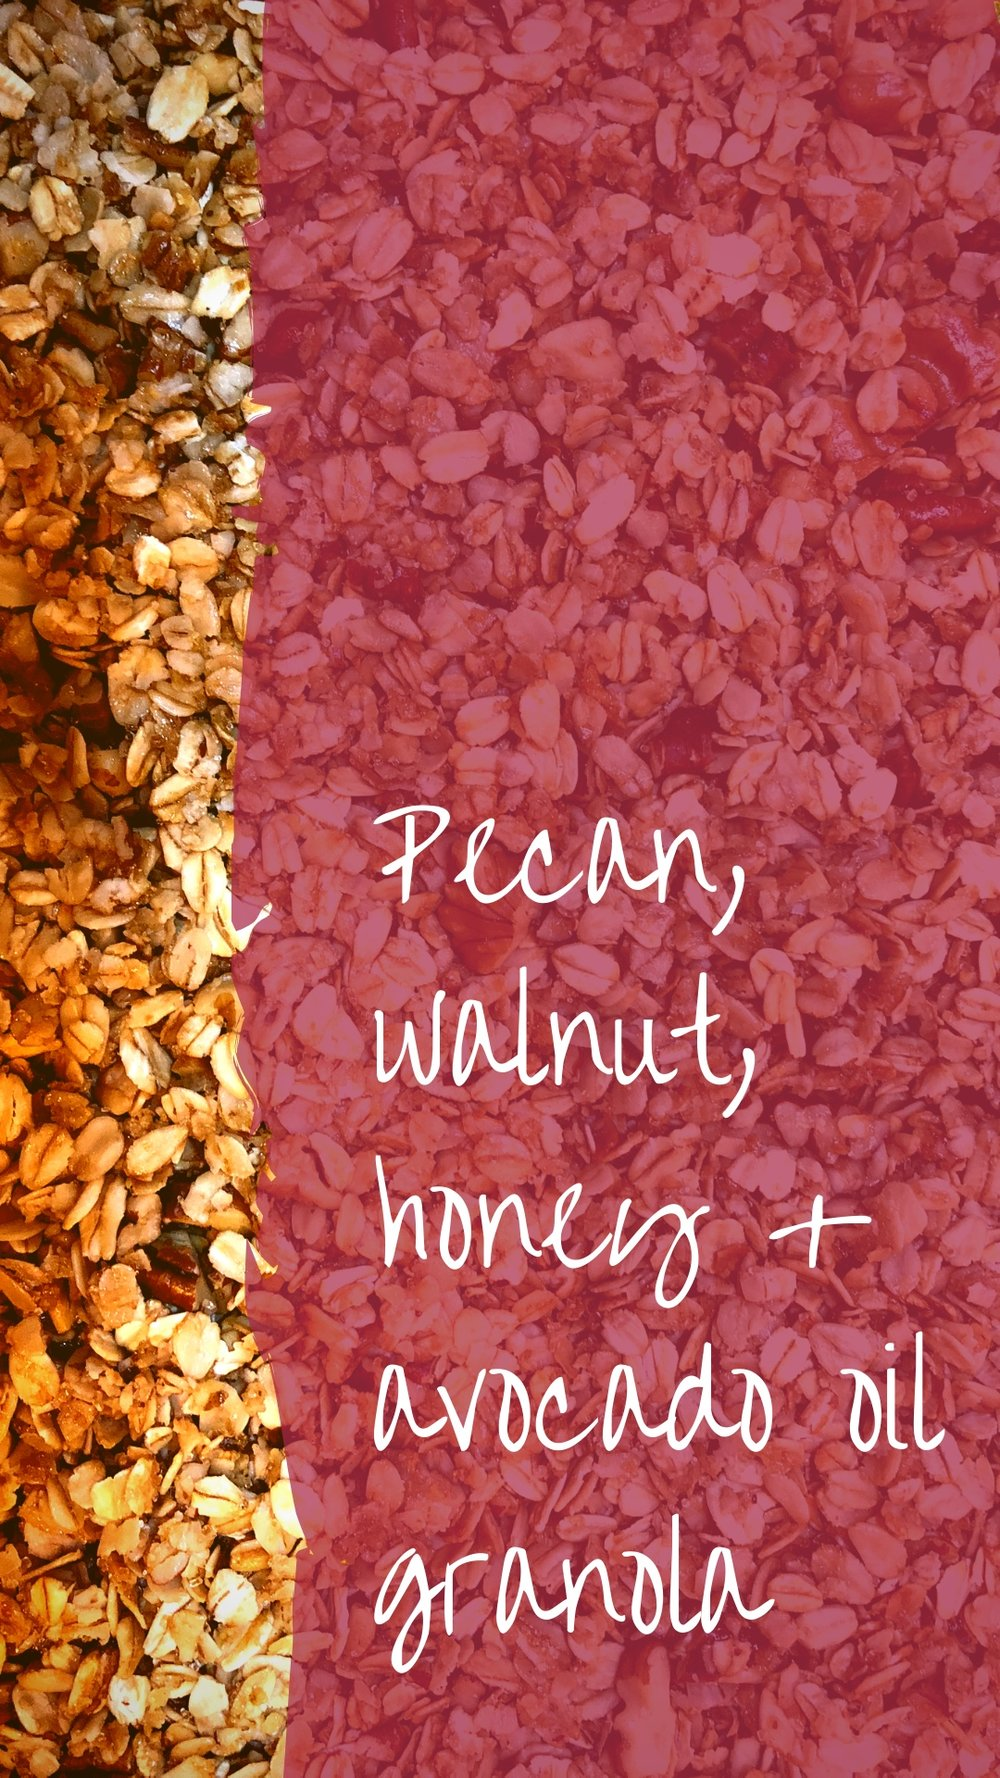 OriginalGranolaRecipe - Pecan, Walnut, Honey and Avocado Granola